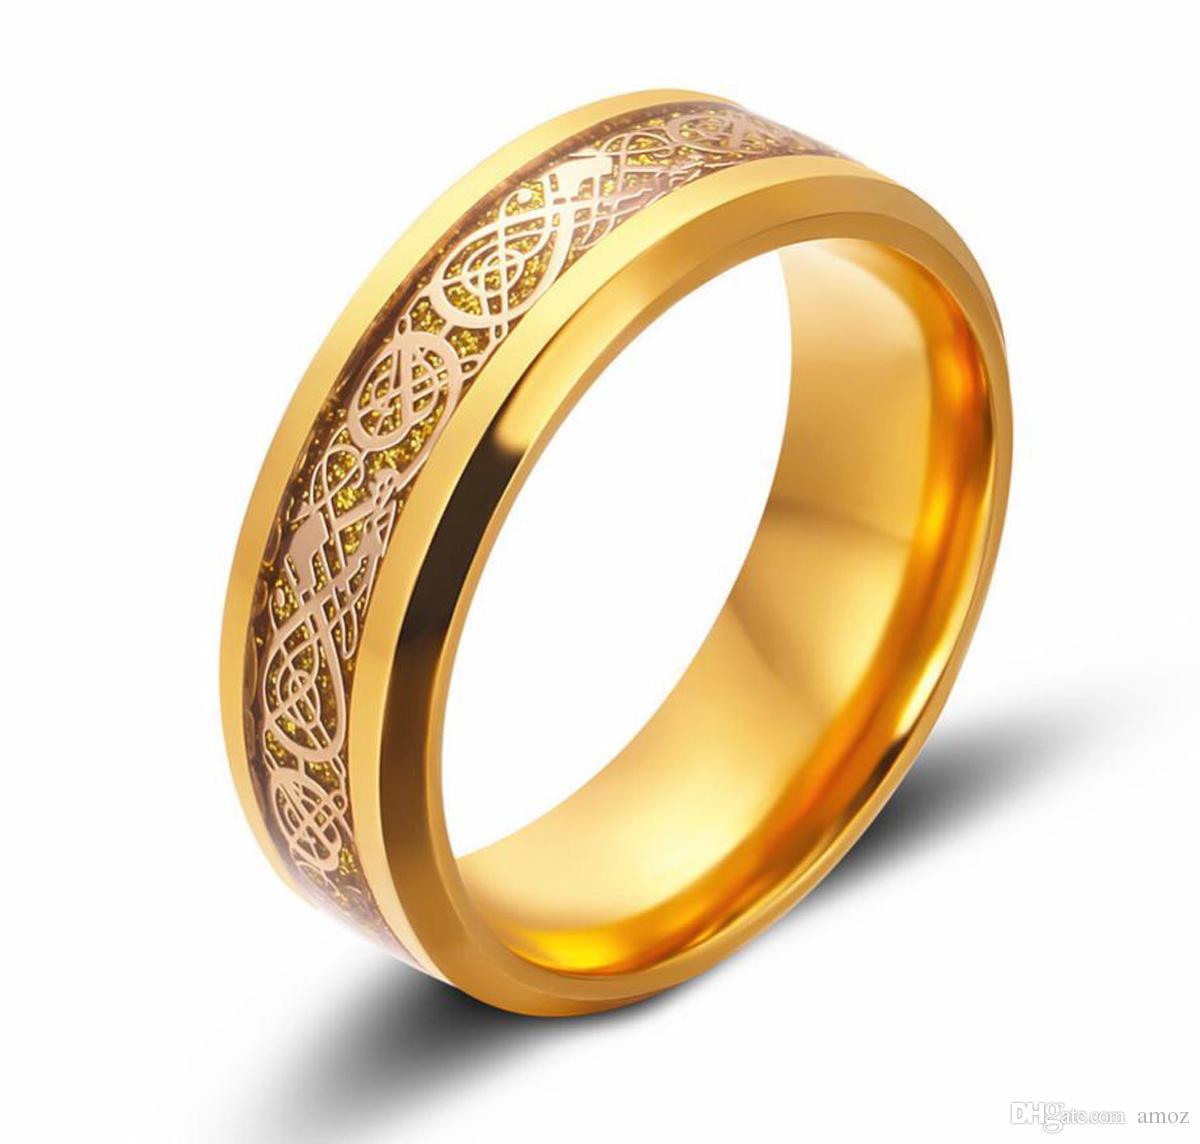 Bague de mariage en acier inoxydable avec anneau en acier inoxydable pour homme